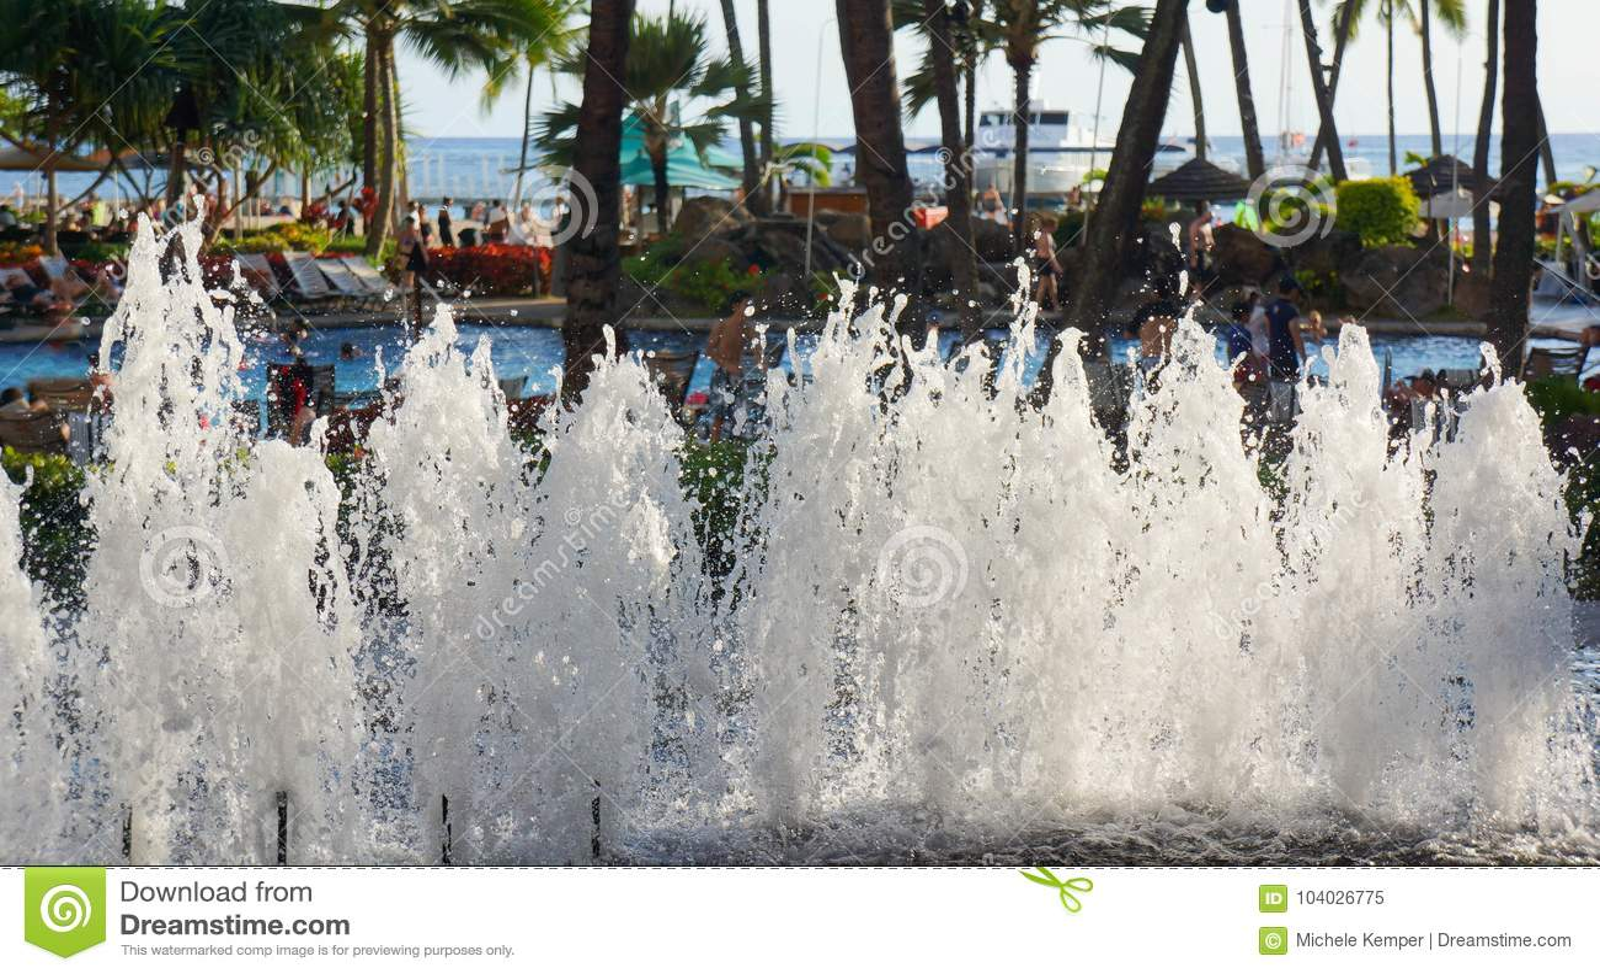 Hilton Hawaiian Village Waikiki Beach Resort Editorial Image